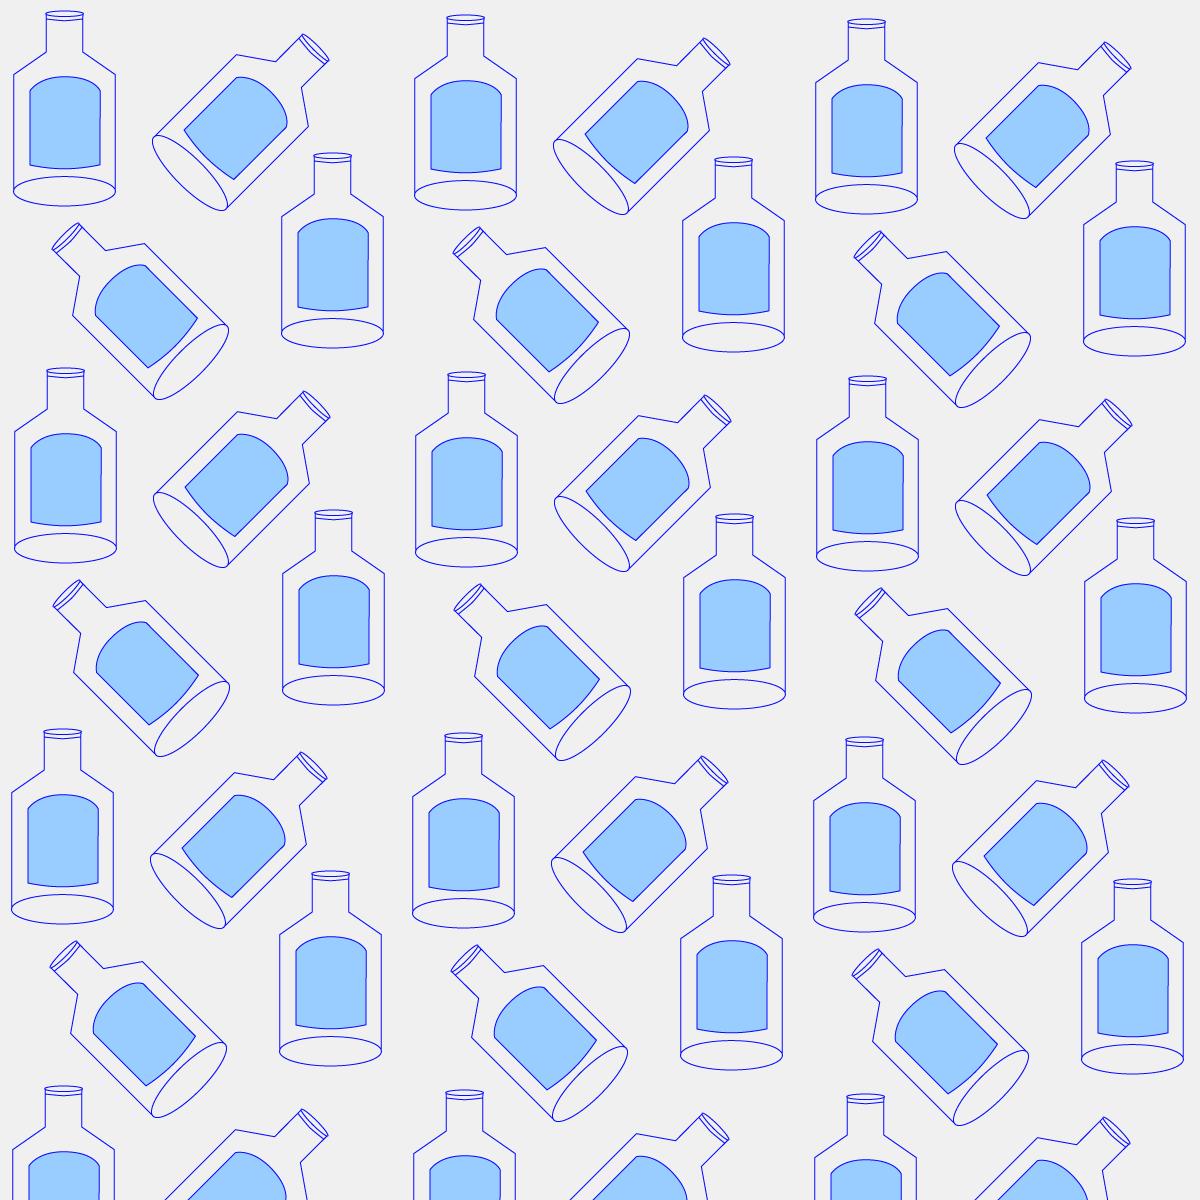 milk bottles in blue outline illustration